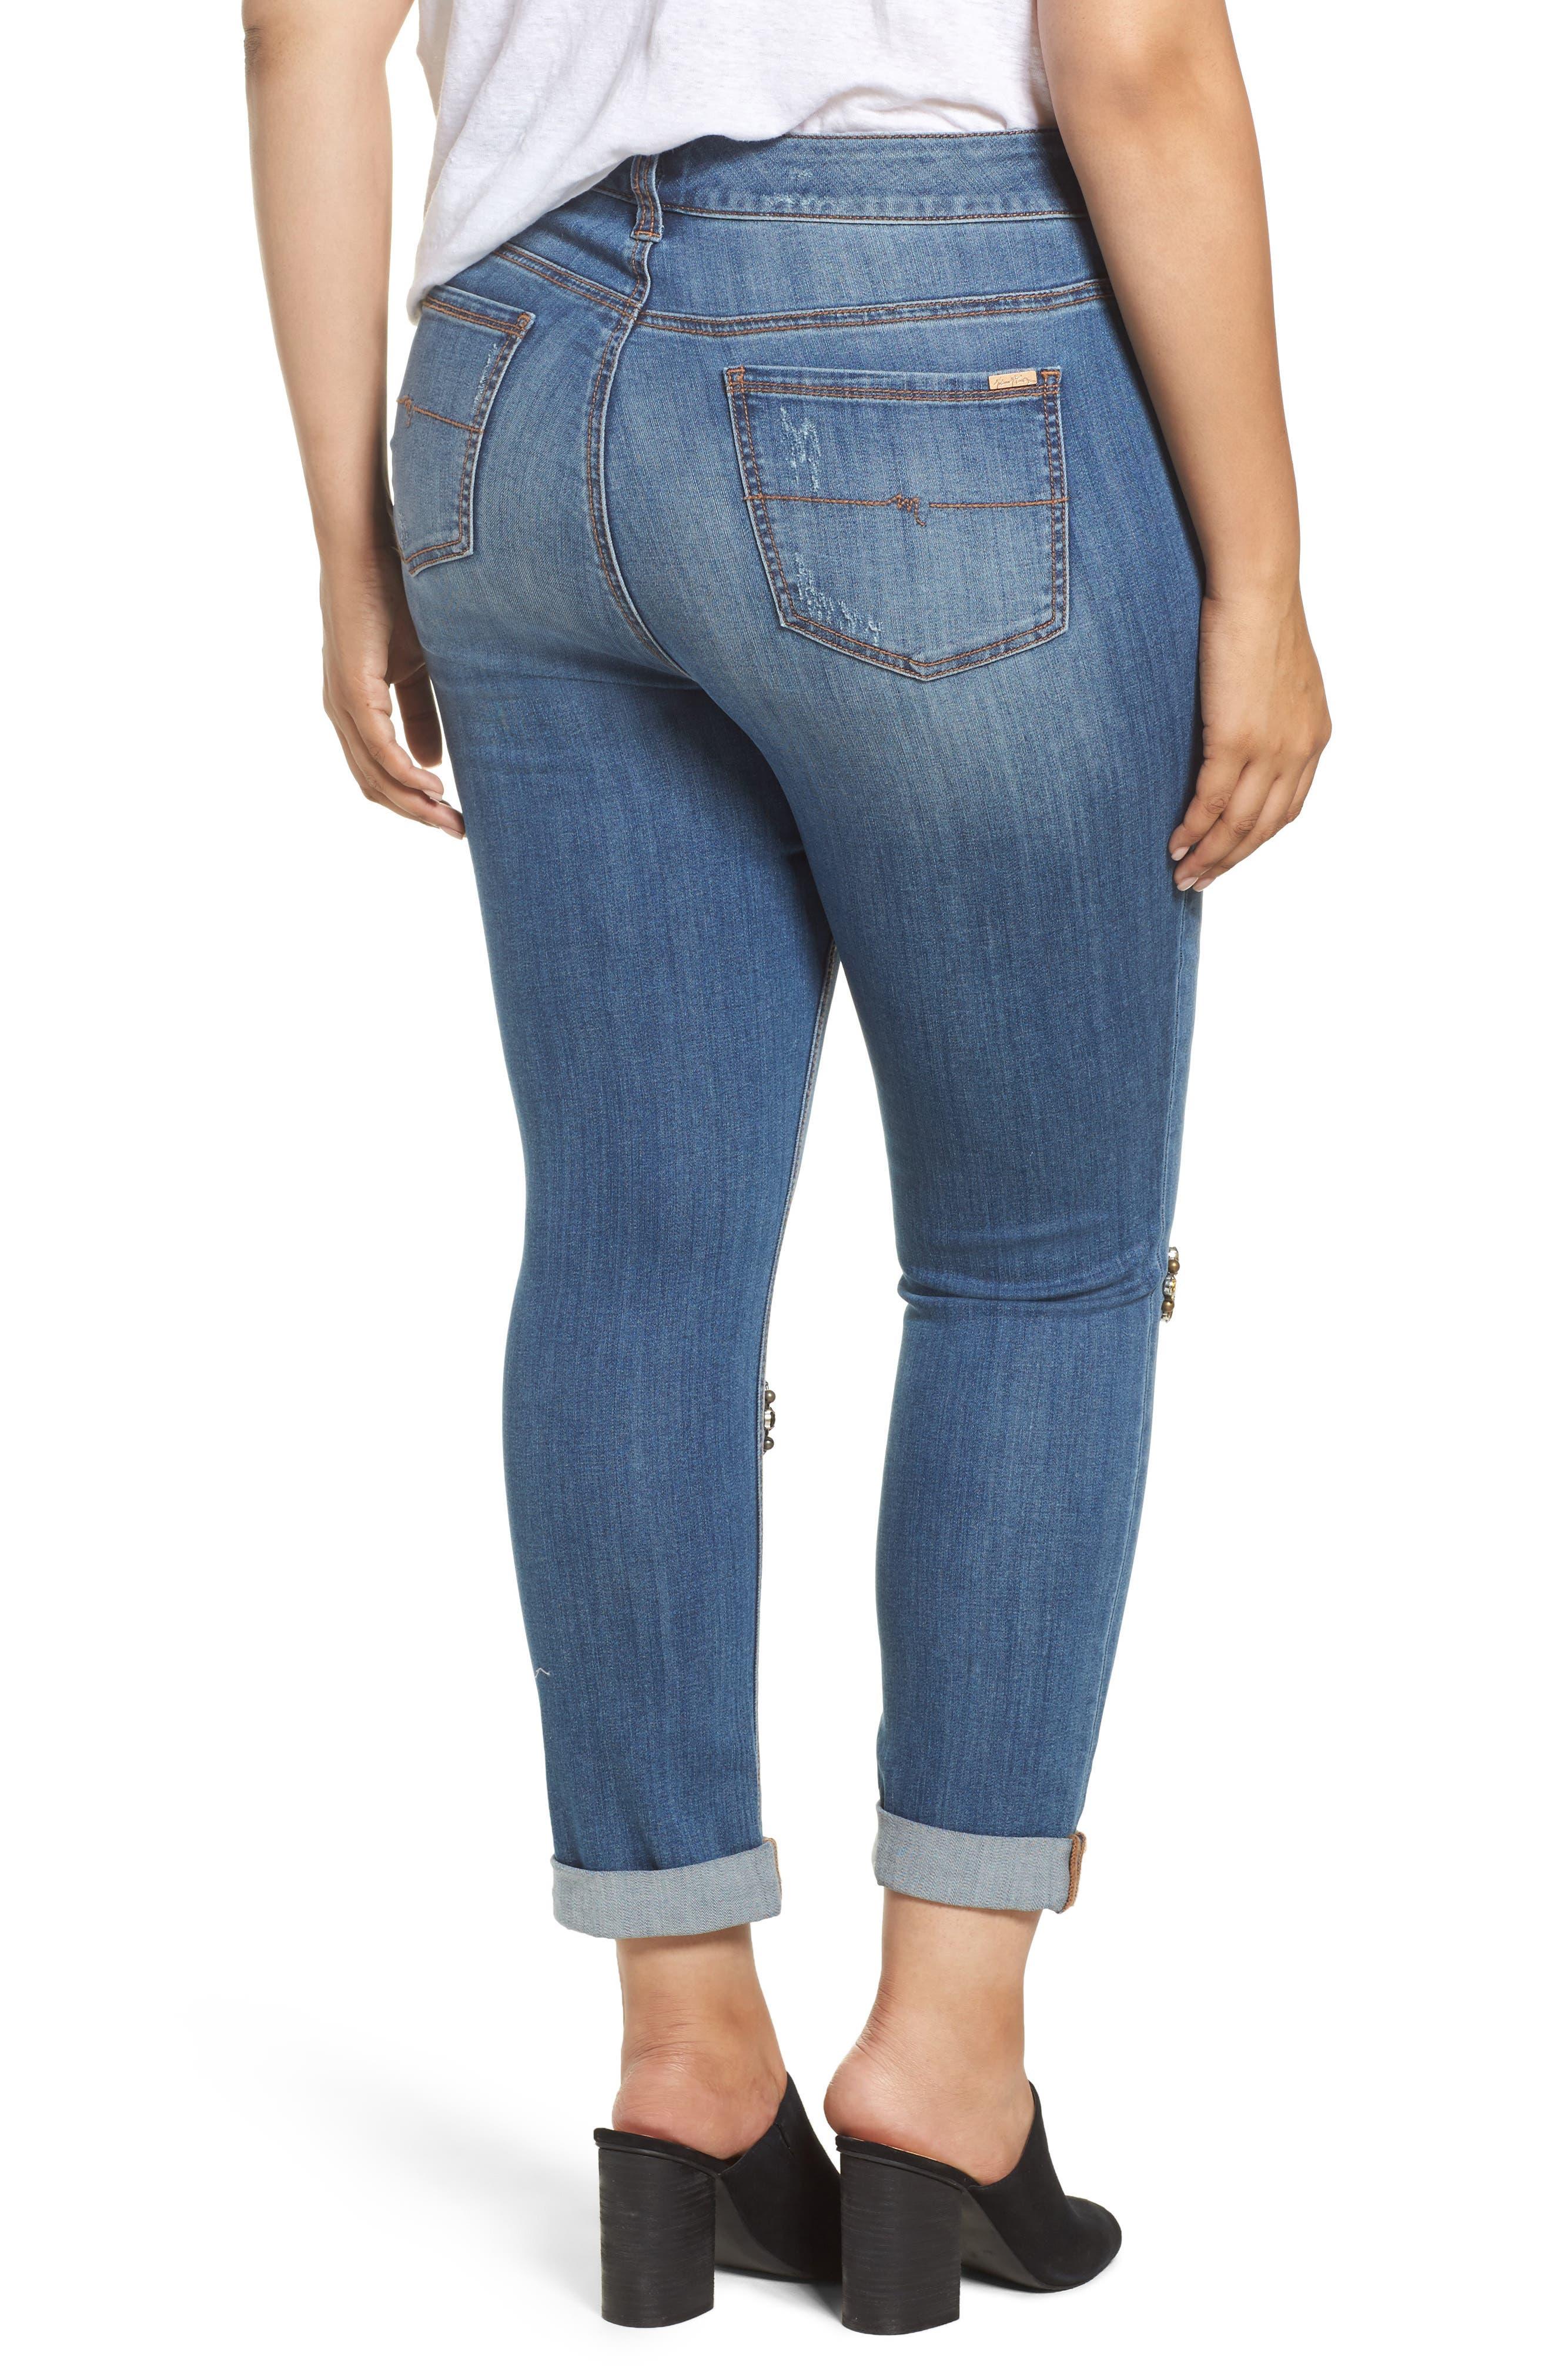 Alternate Image 2  - Melissa McCarthy Seven7 Jeweled Skinny Jeans (Heiress) (Plus Size)